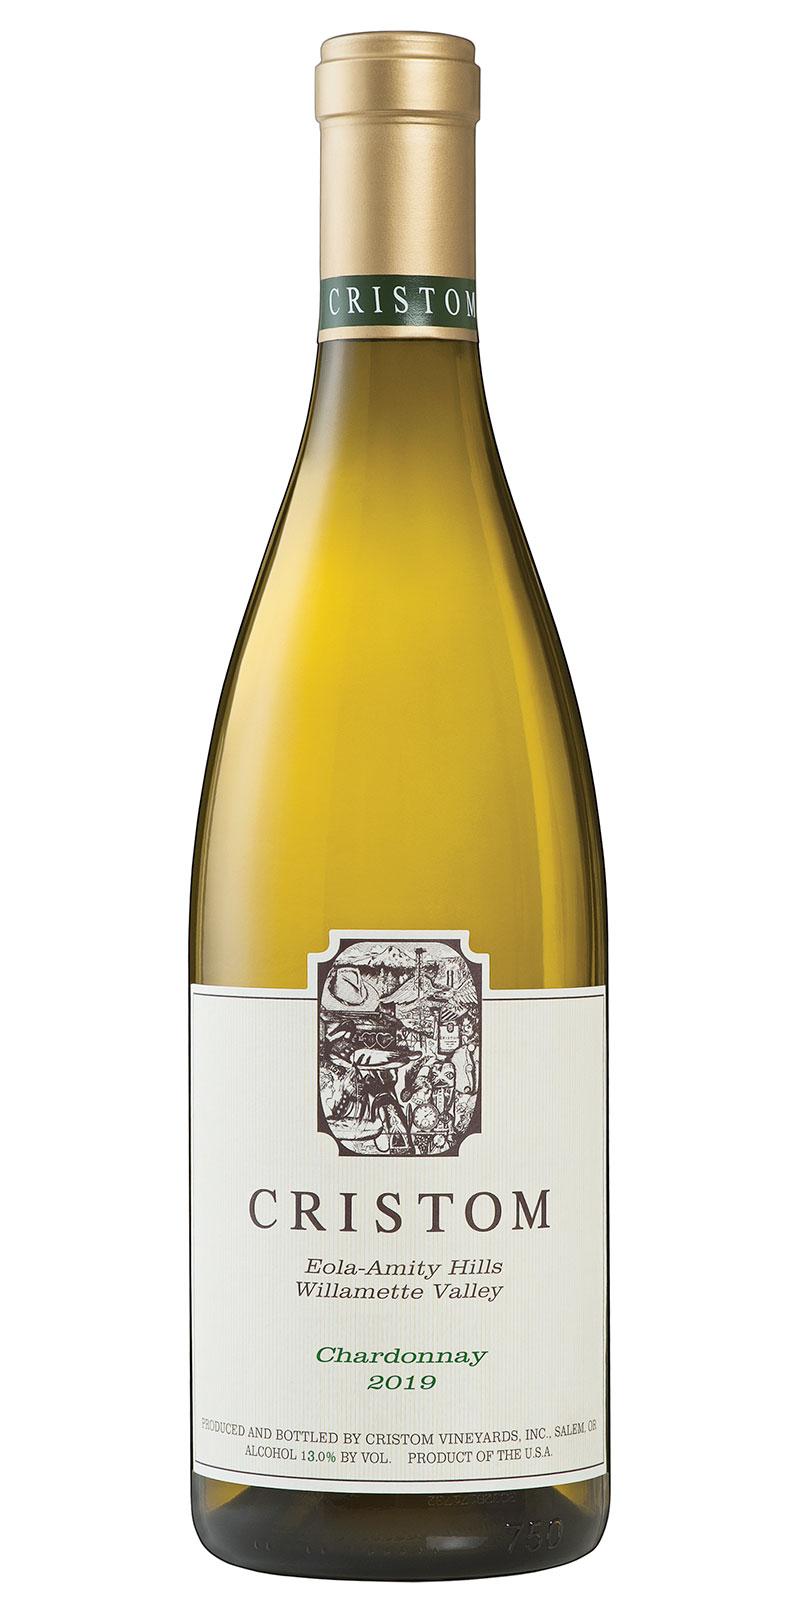 Cristom Eola-Amity Hills Willamette Valley Chardonnay 2019 bottle